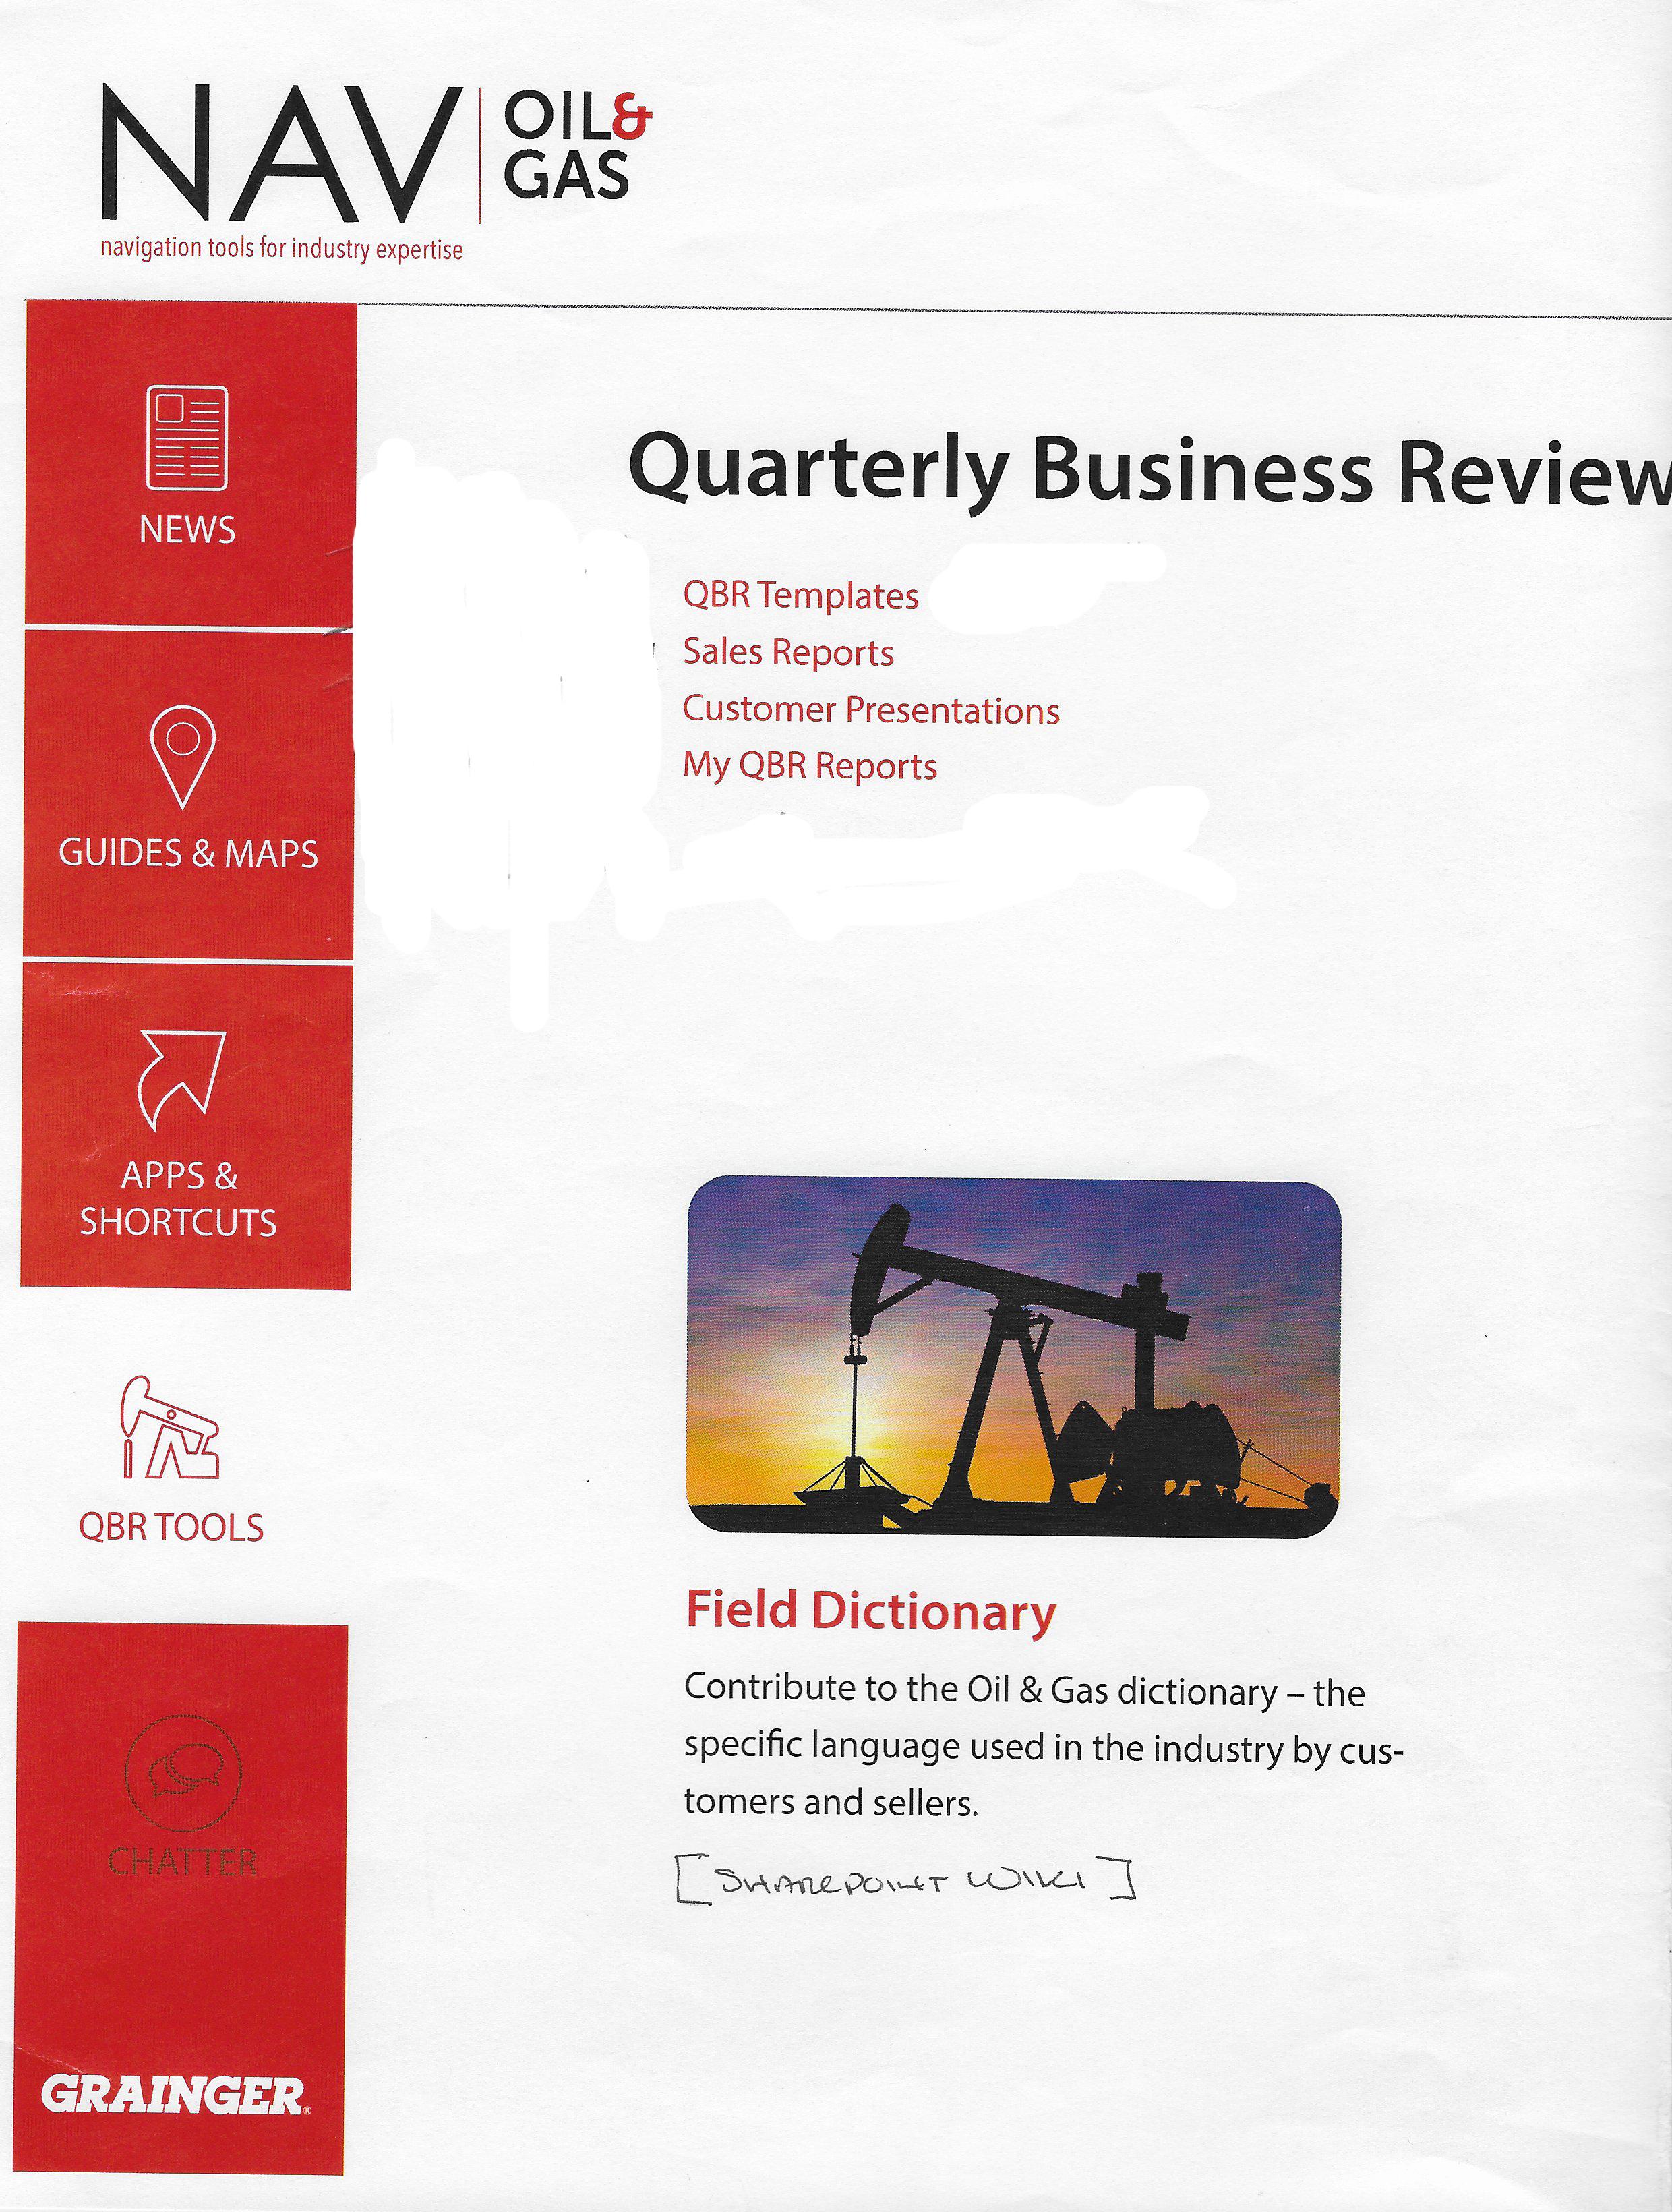 Grainger Oil & Gas Home Page